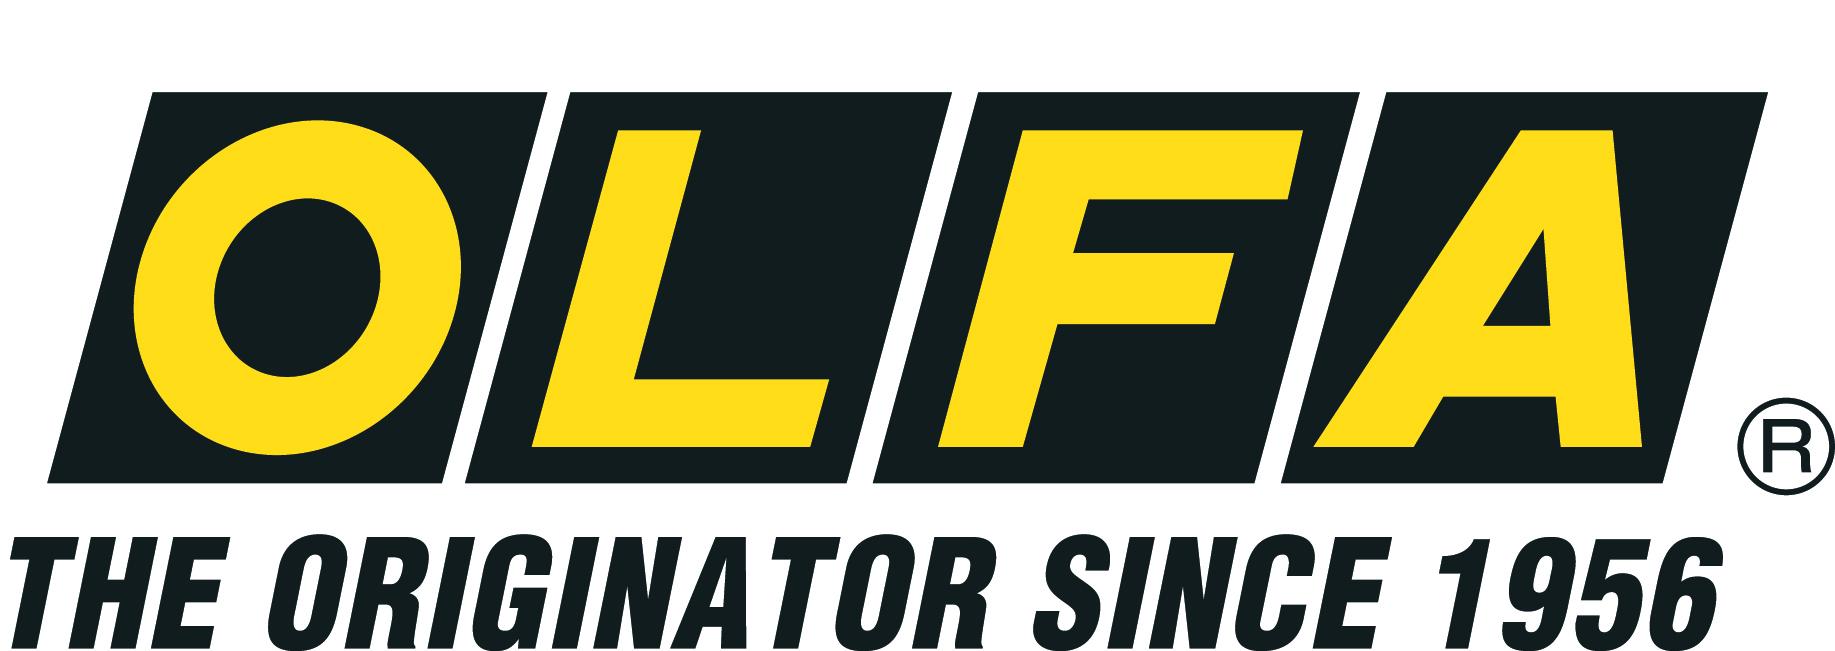 Olfa logo